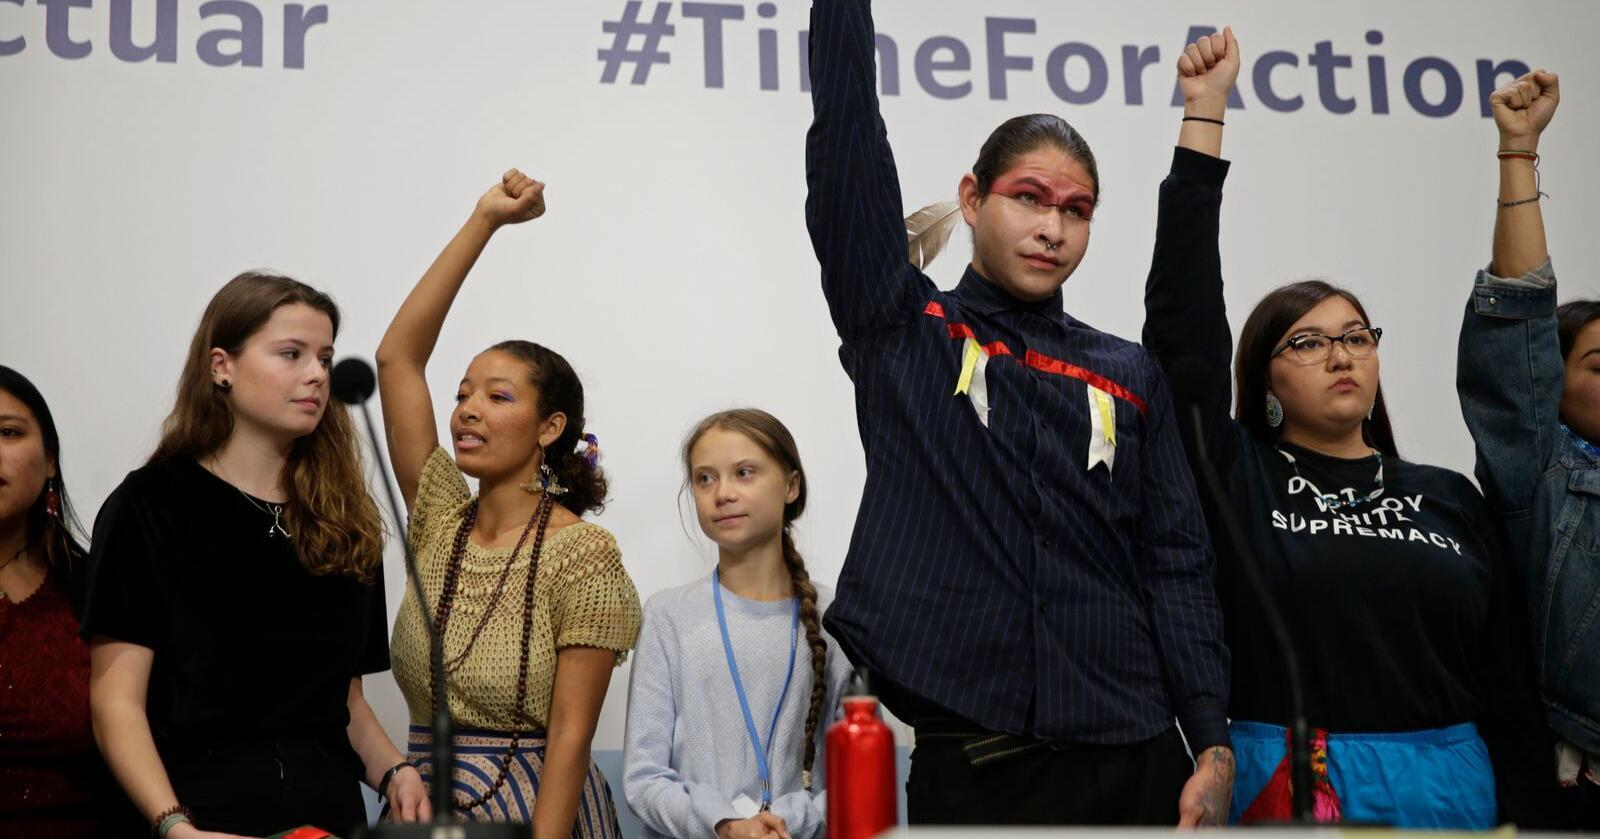 Klimaaktivist Greta Thunberg, i midten og i bakgrunnen, med andre unge aktivister for miljøet under COP25 i Madrid mandag. Foto: Andrea Comas / AP / NTB scanpix